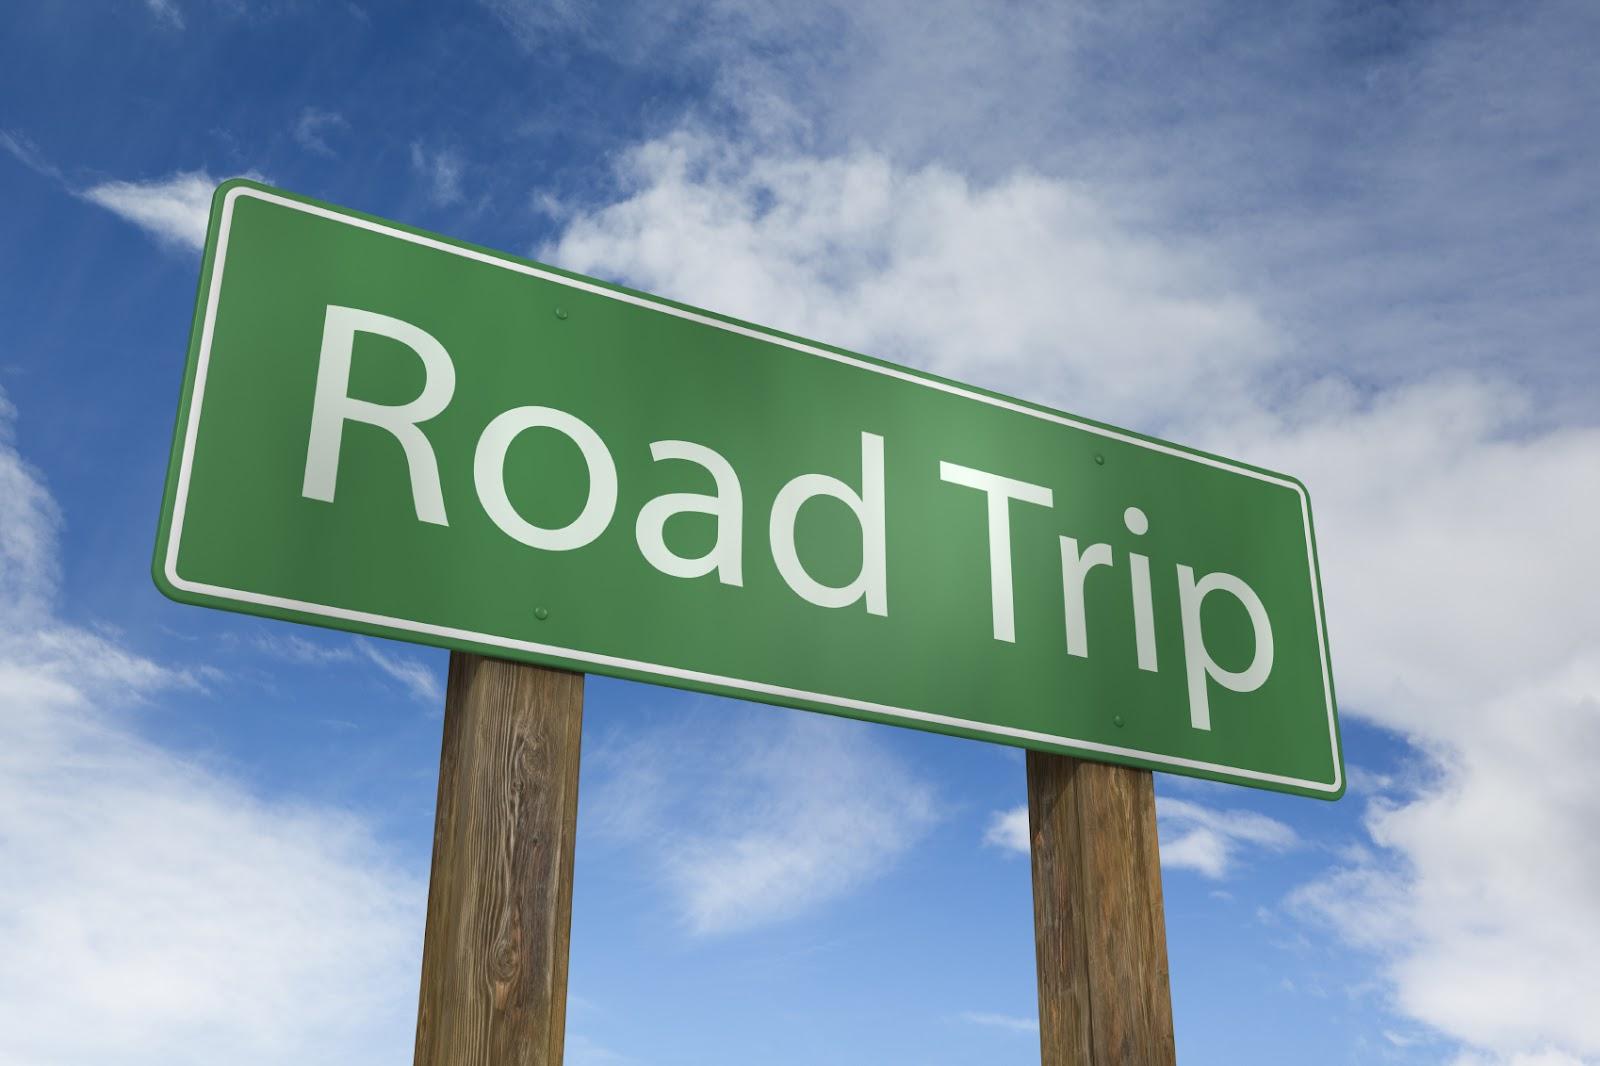 Dnsyl57: Road Trip